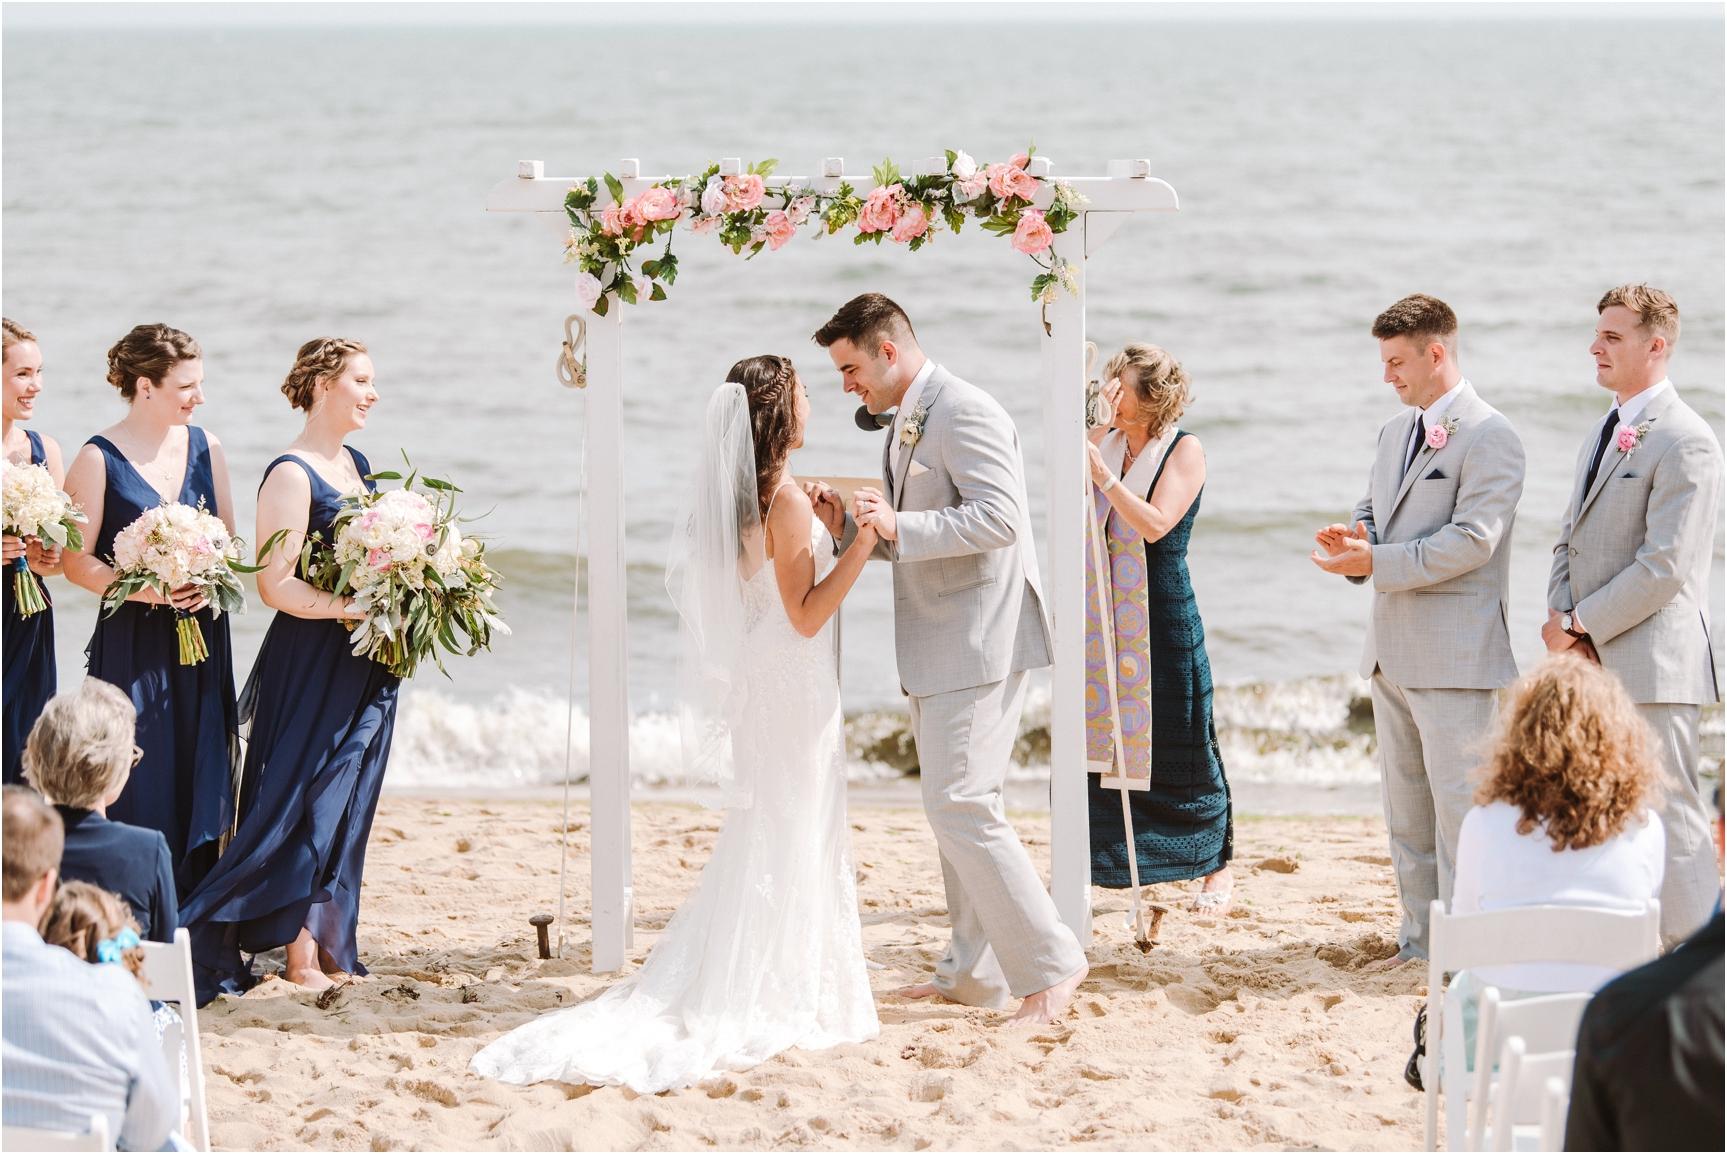 Sarah & Sam Pelham House Cape Cod Wedding Photographer-113.jpg